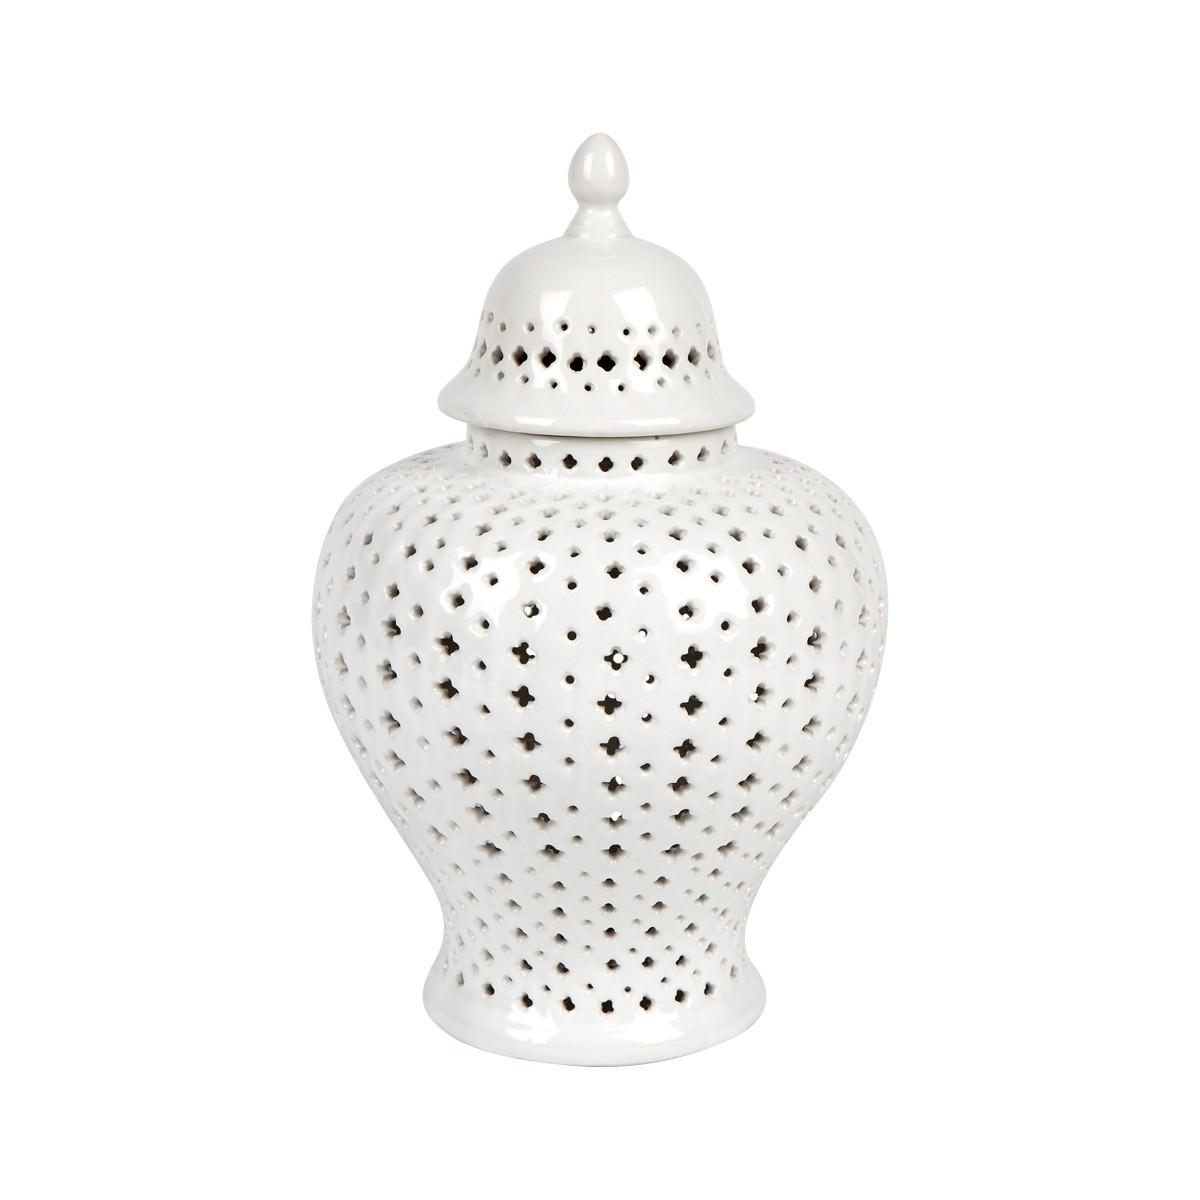 Minx Porcelain Temple Jar, Small, White